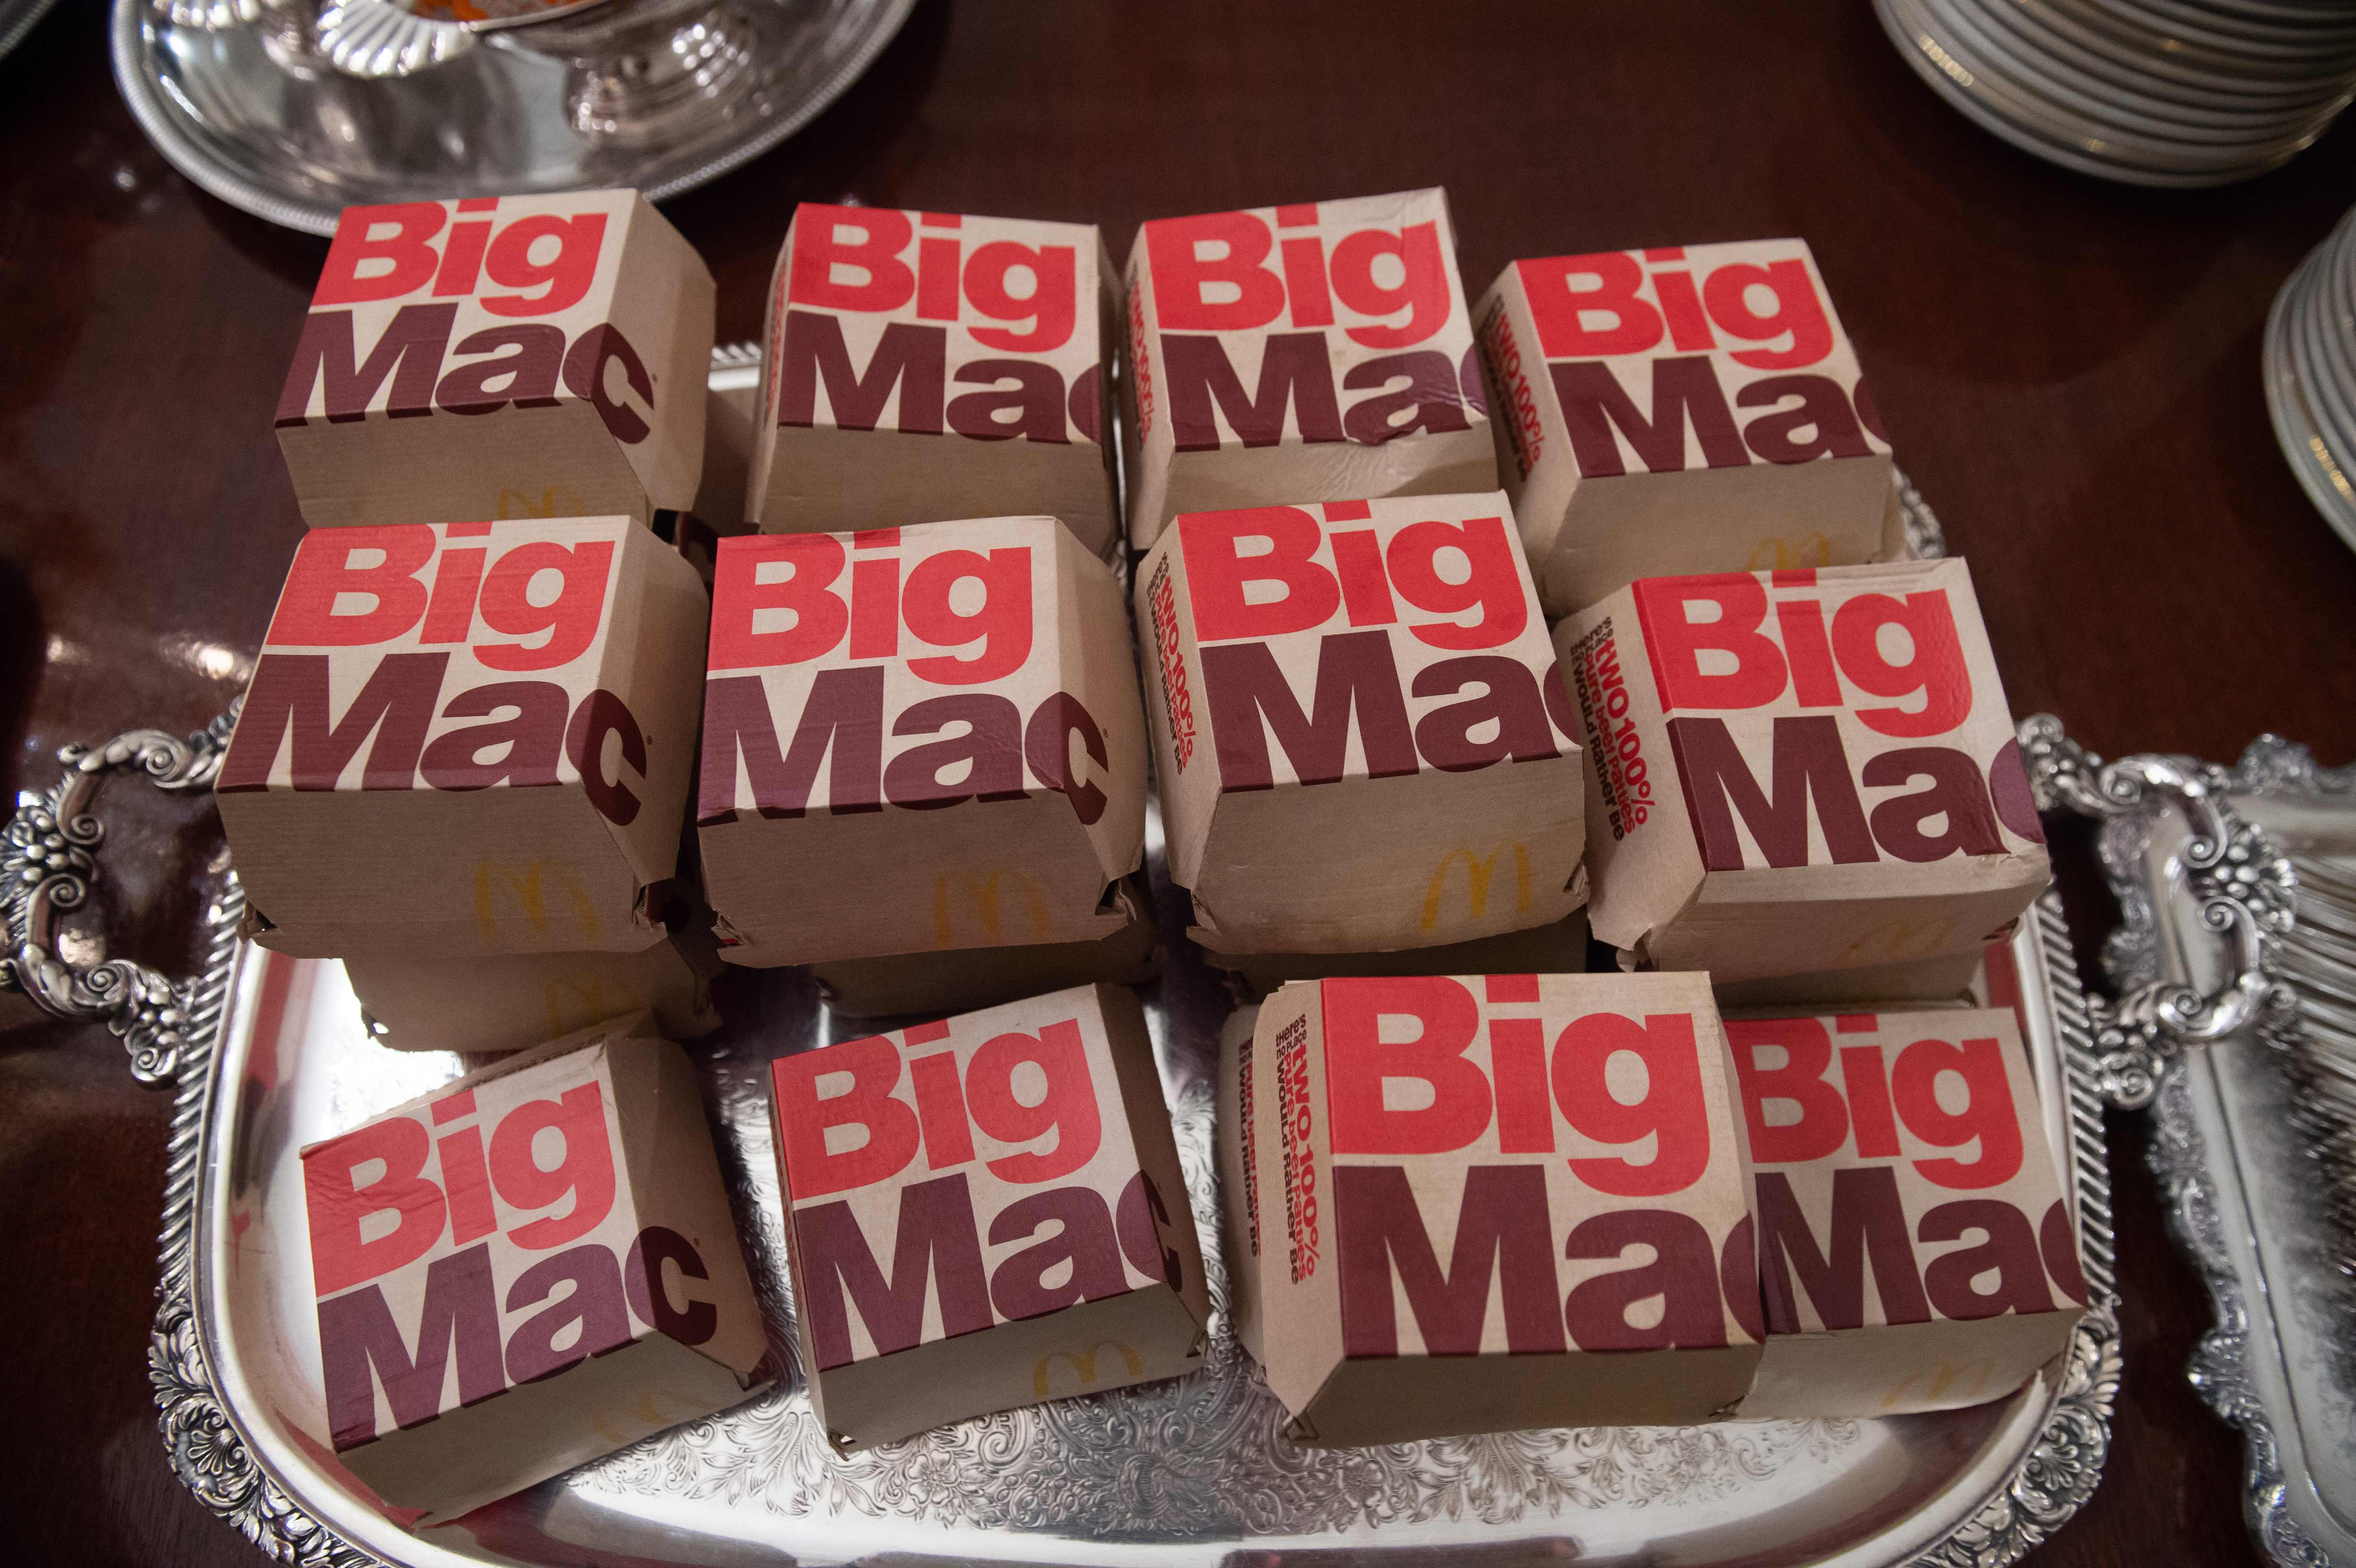 McDonald's loses Big Mac trademark. Burger King adds 'Like a Big Mac, but actually big.'